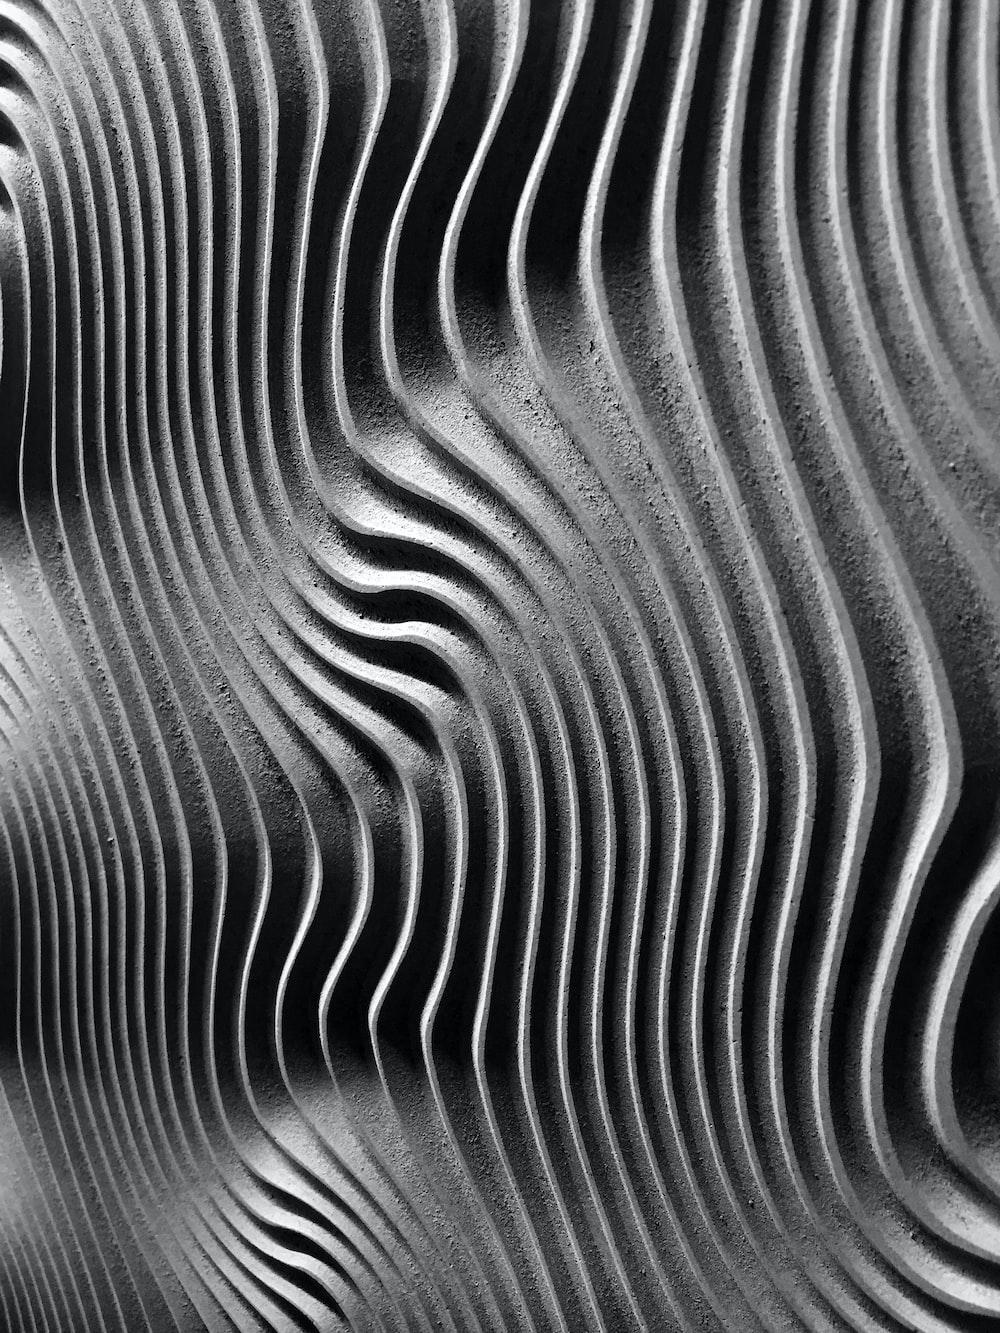 gray spiral artwork